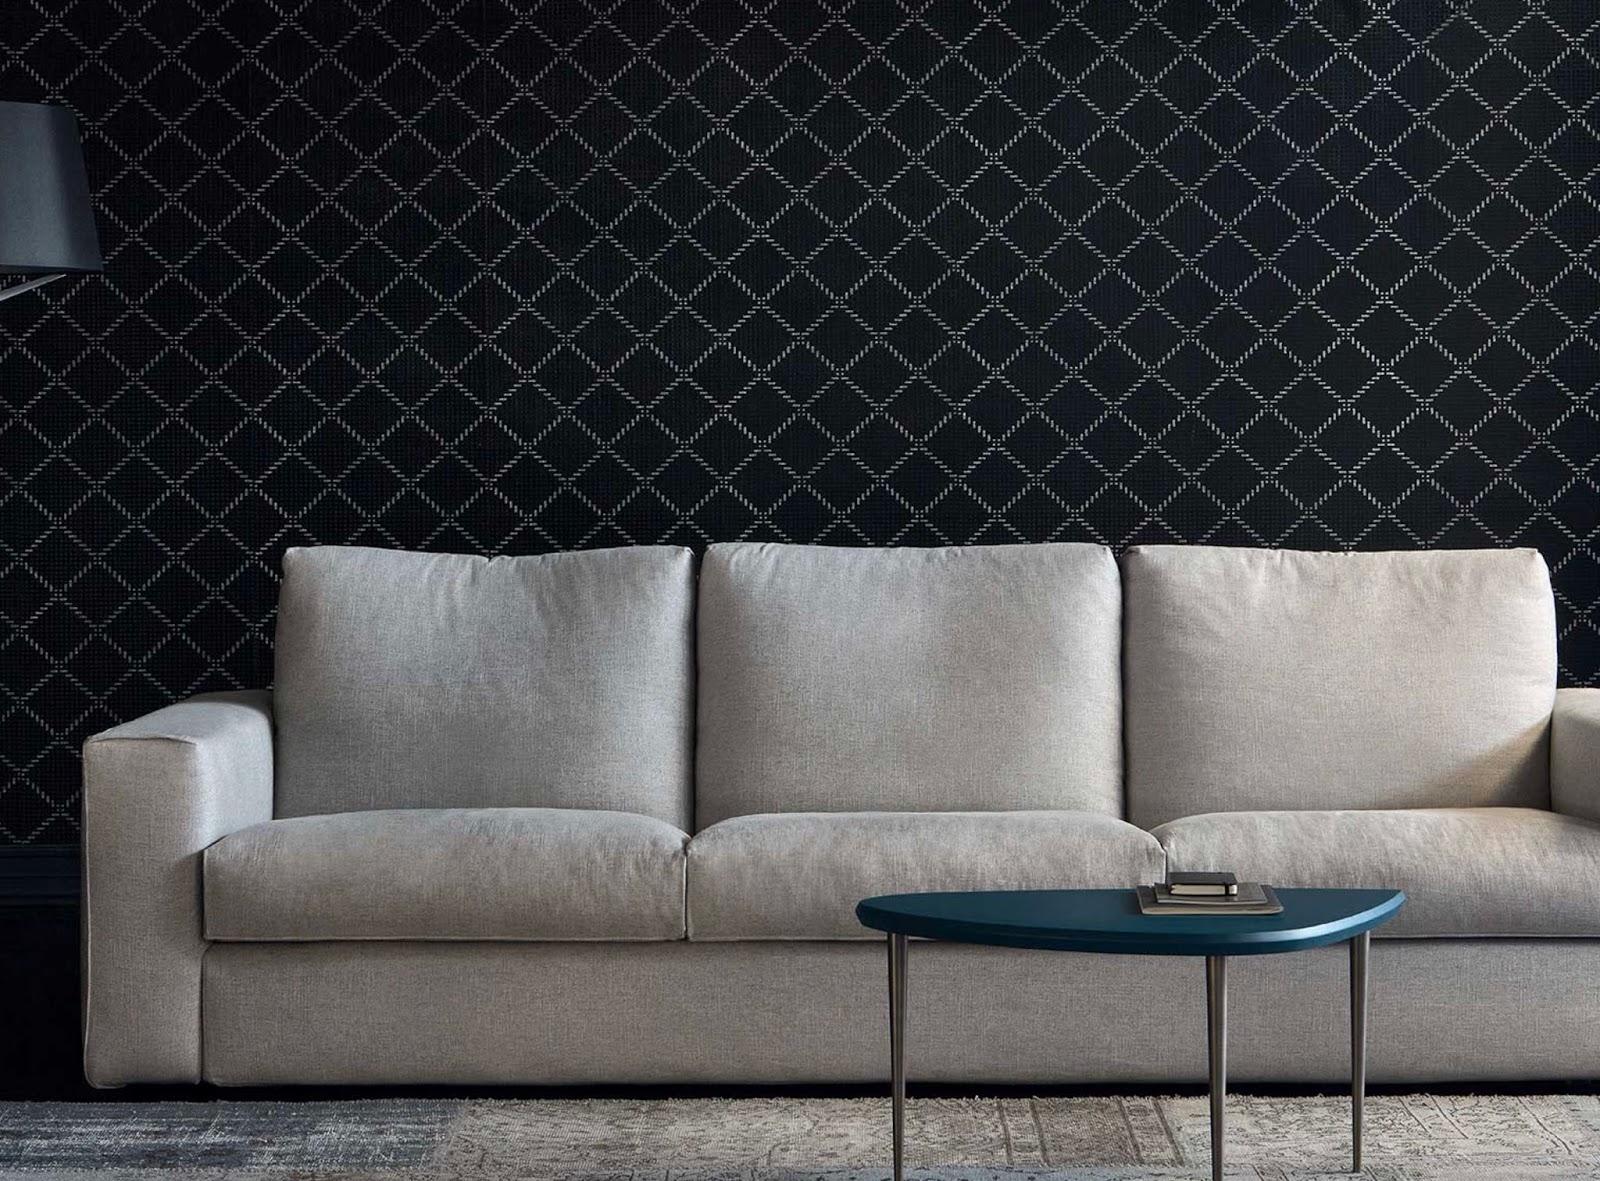 bed and sofa warehouse leeds wood outdoor italian companies luxury furniture brands design